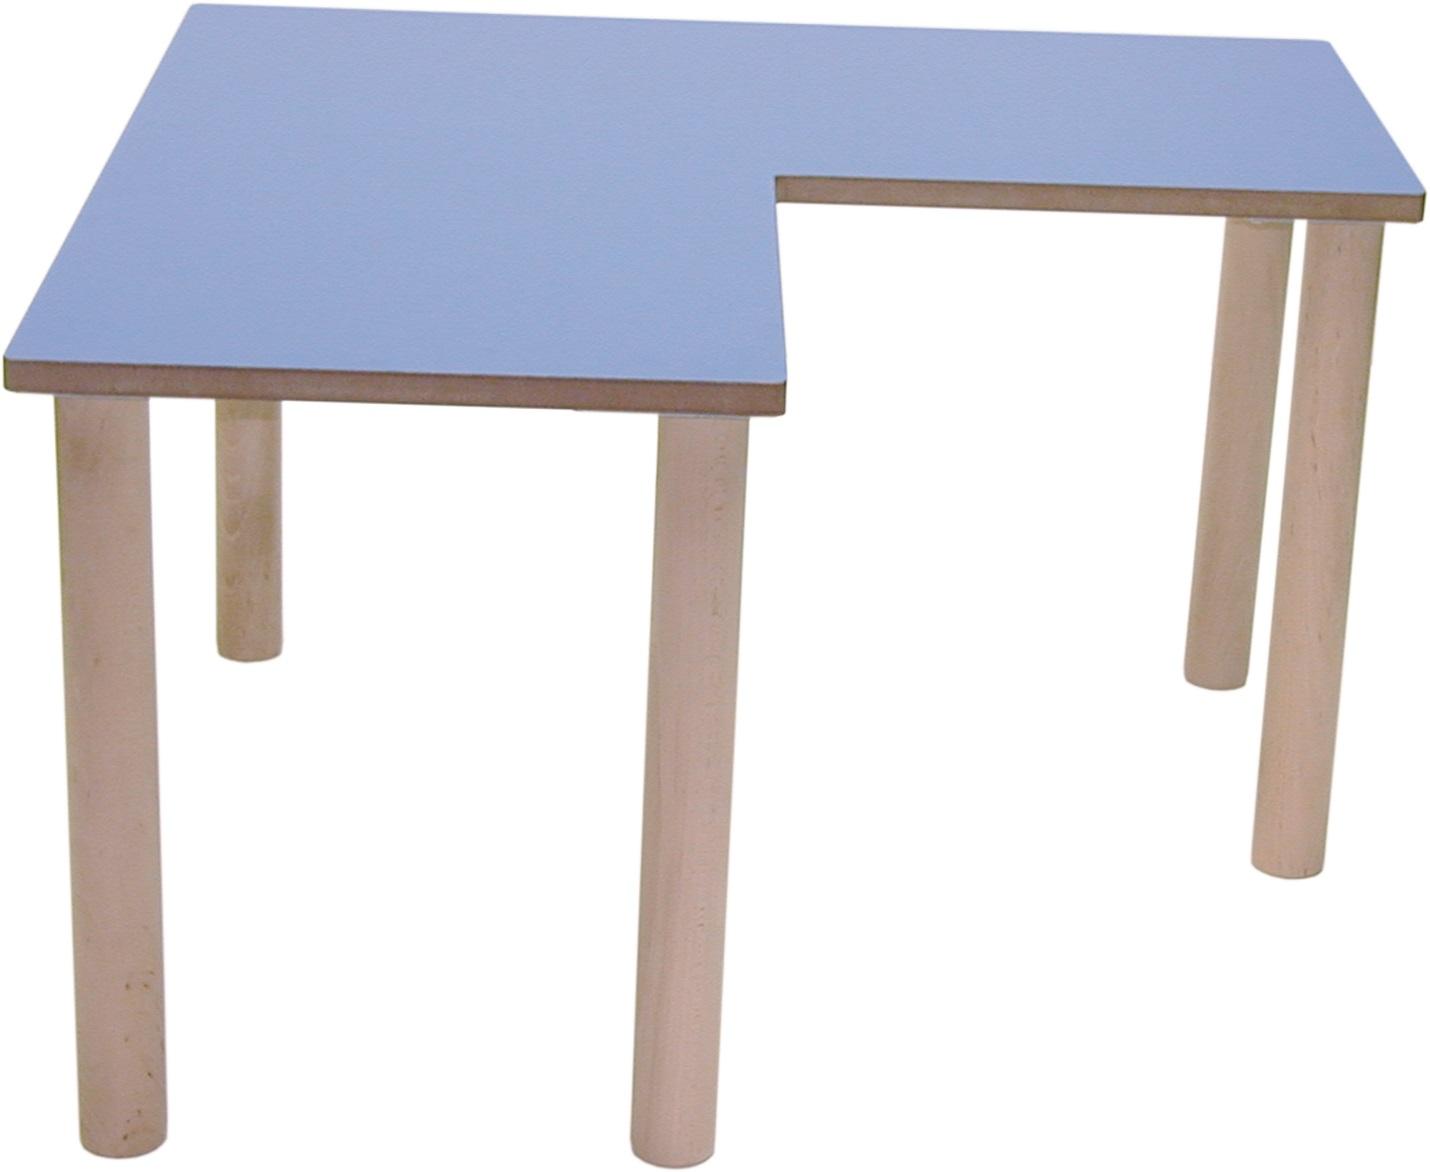 Mesa l guay mobiliario infantil escolar guarderias madera - Mesas infantiles madera ...